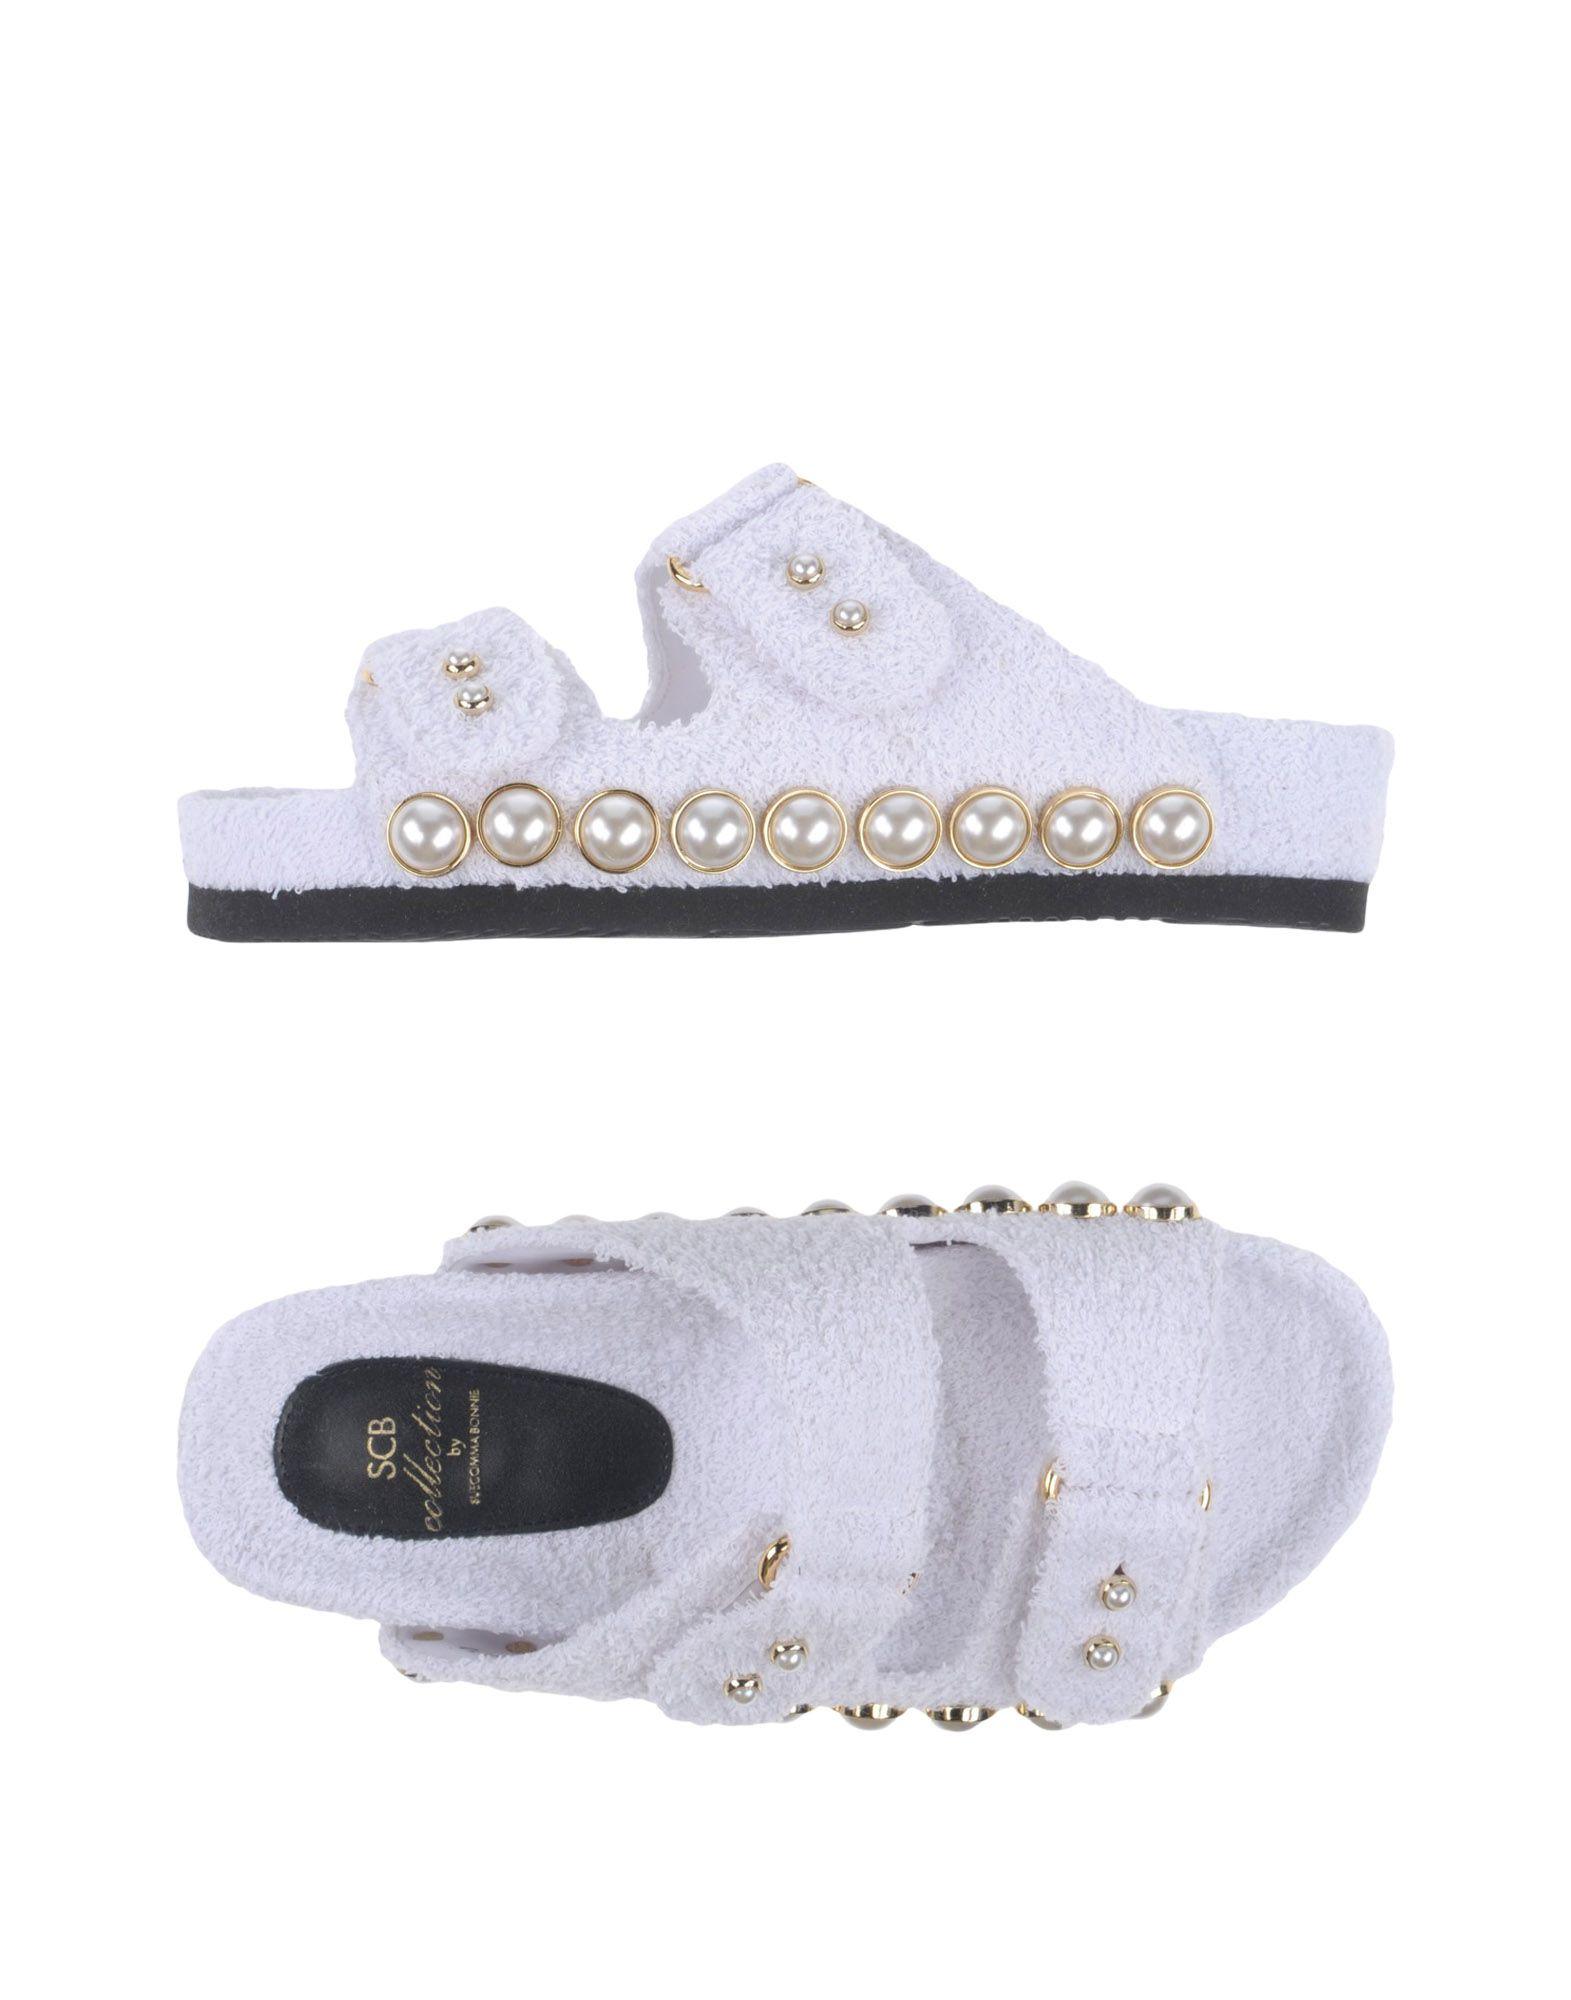 Suecomma Bonnie Sandalen Damen  11386572CF Gute Qualität beliebte Schuhe